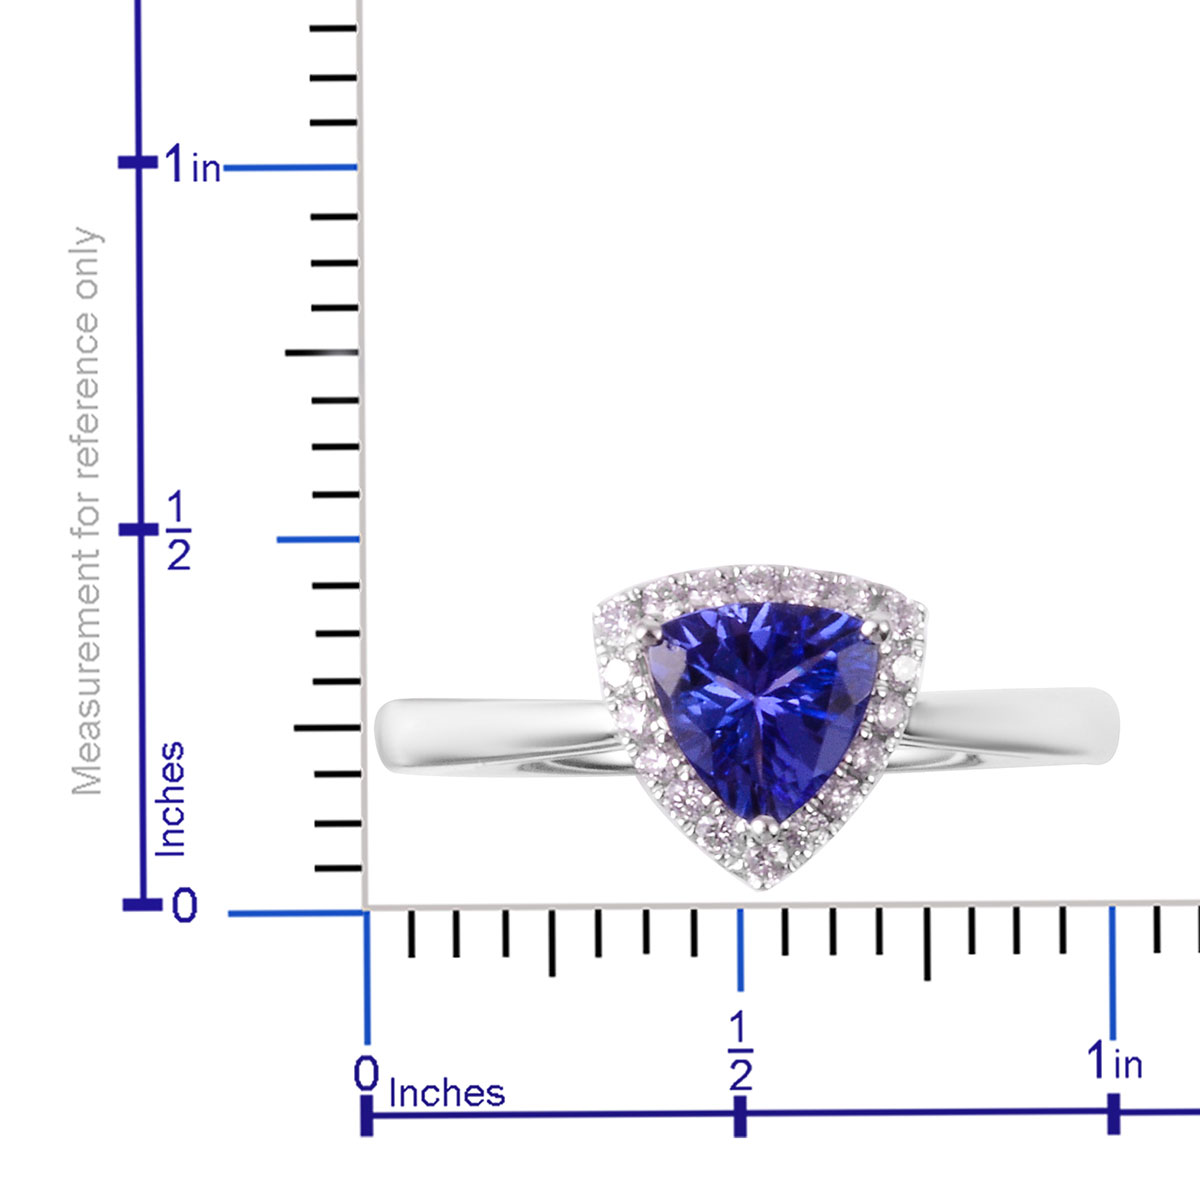 ILIANA AAAA Premium Tanzanite, Diamond (0.13 ct) Halo Ring in 18K White Gold (Size 8.0) 0.88 ctw